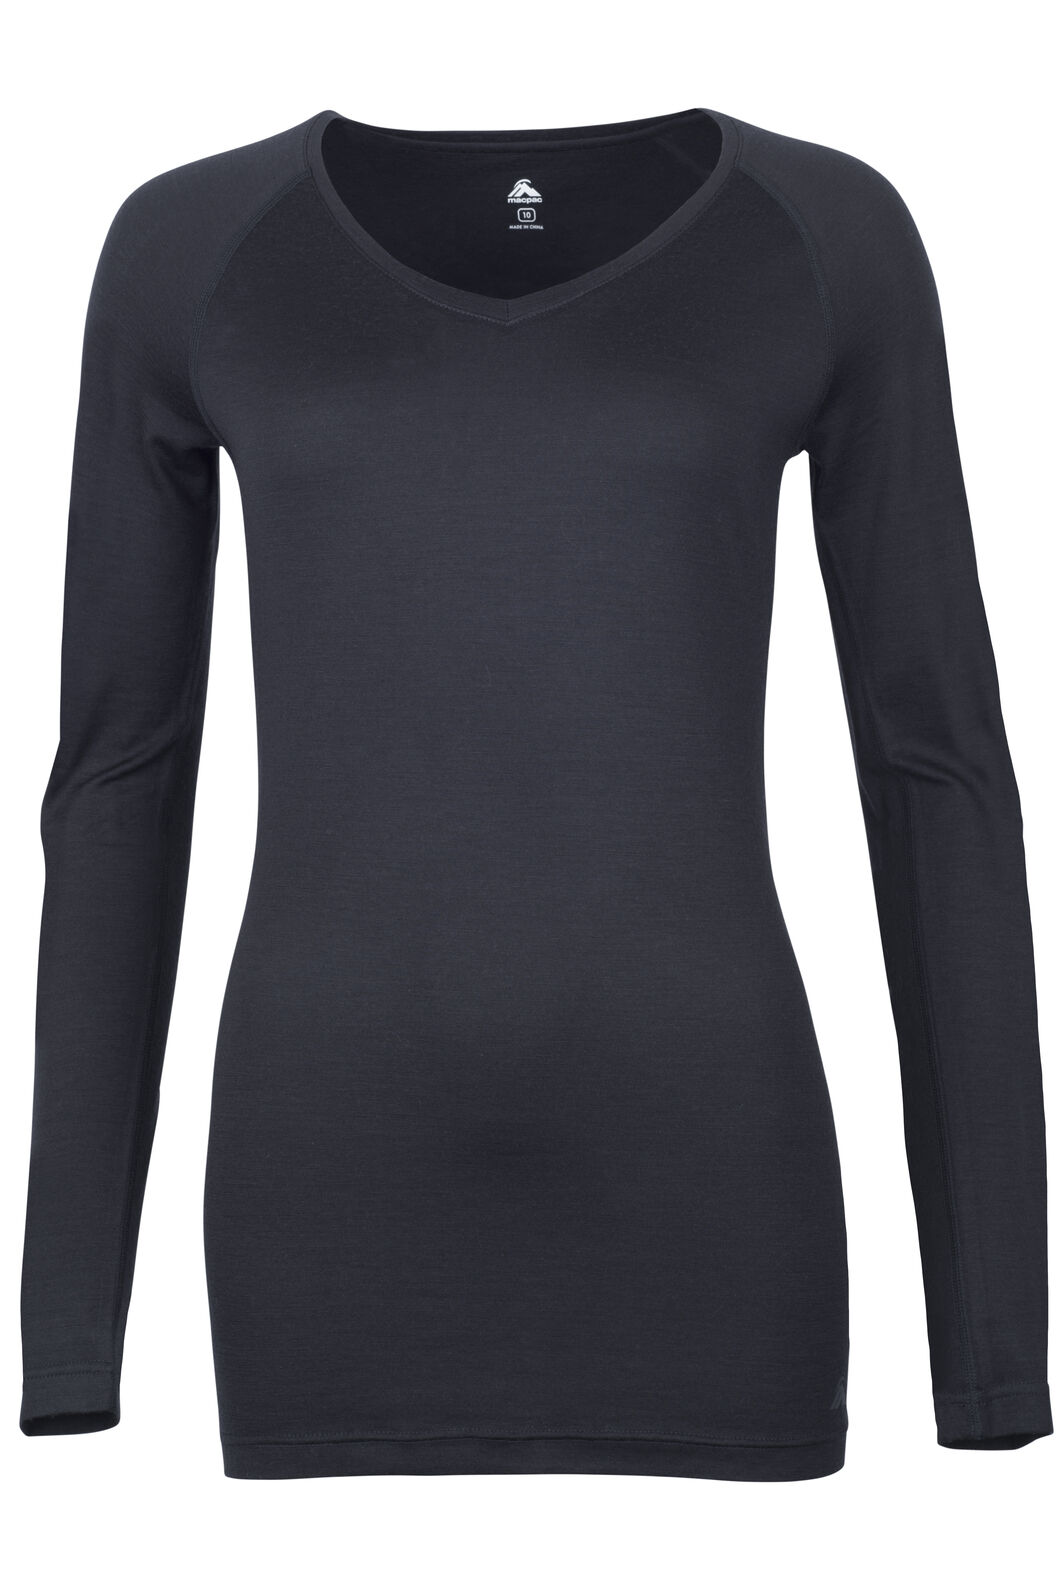 150 Merino V-Neck Top - Women's, Black, hi-res